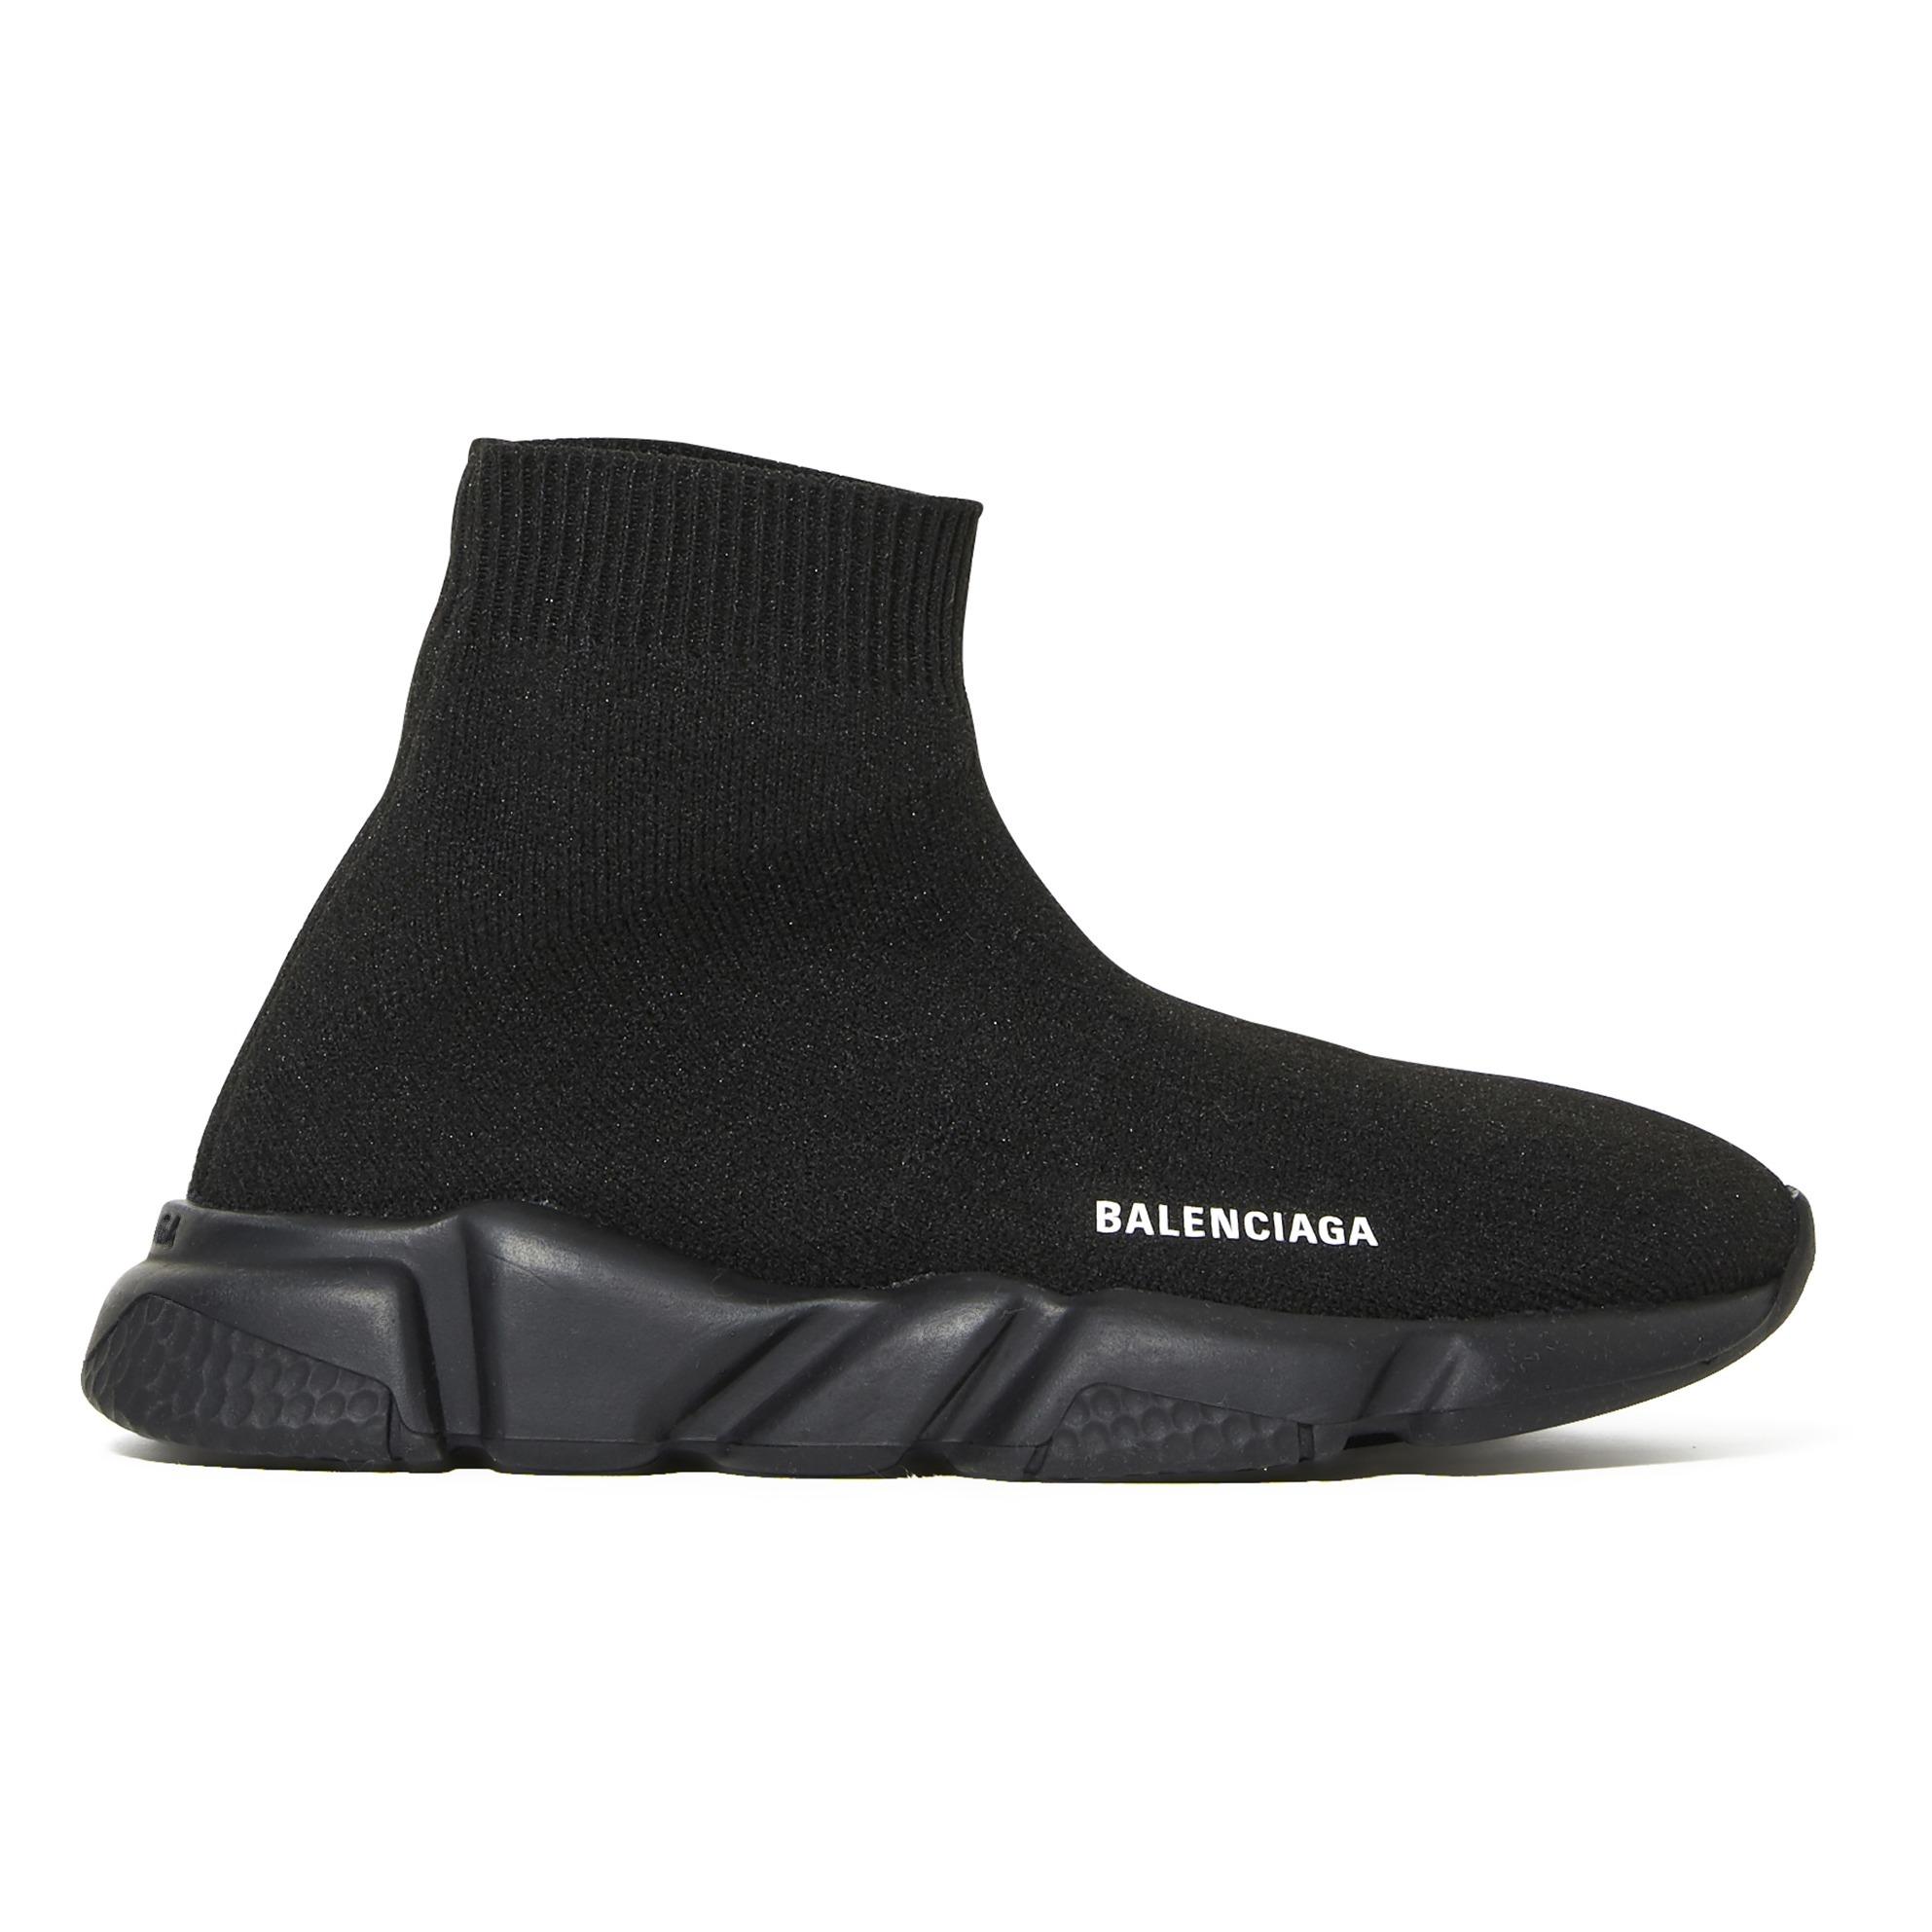 Total Black Speed Trainers Black Balenciaga Shoes Children